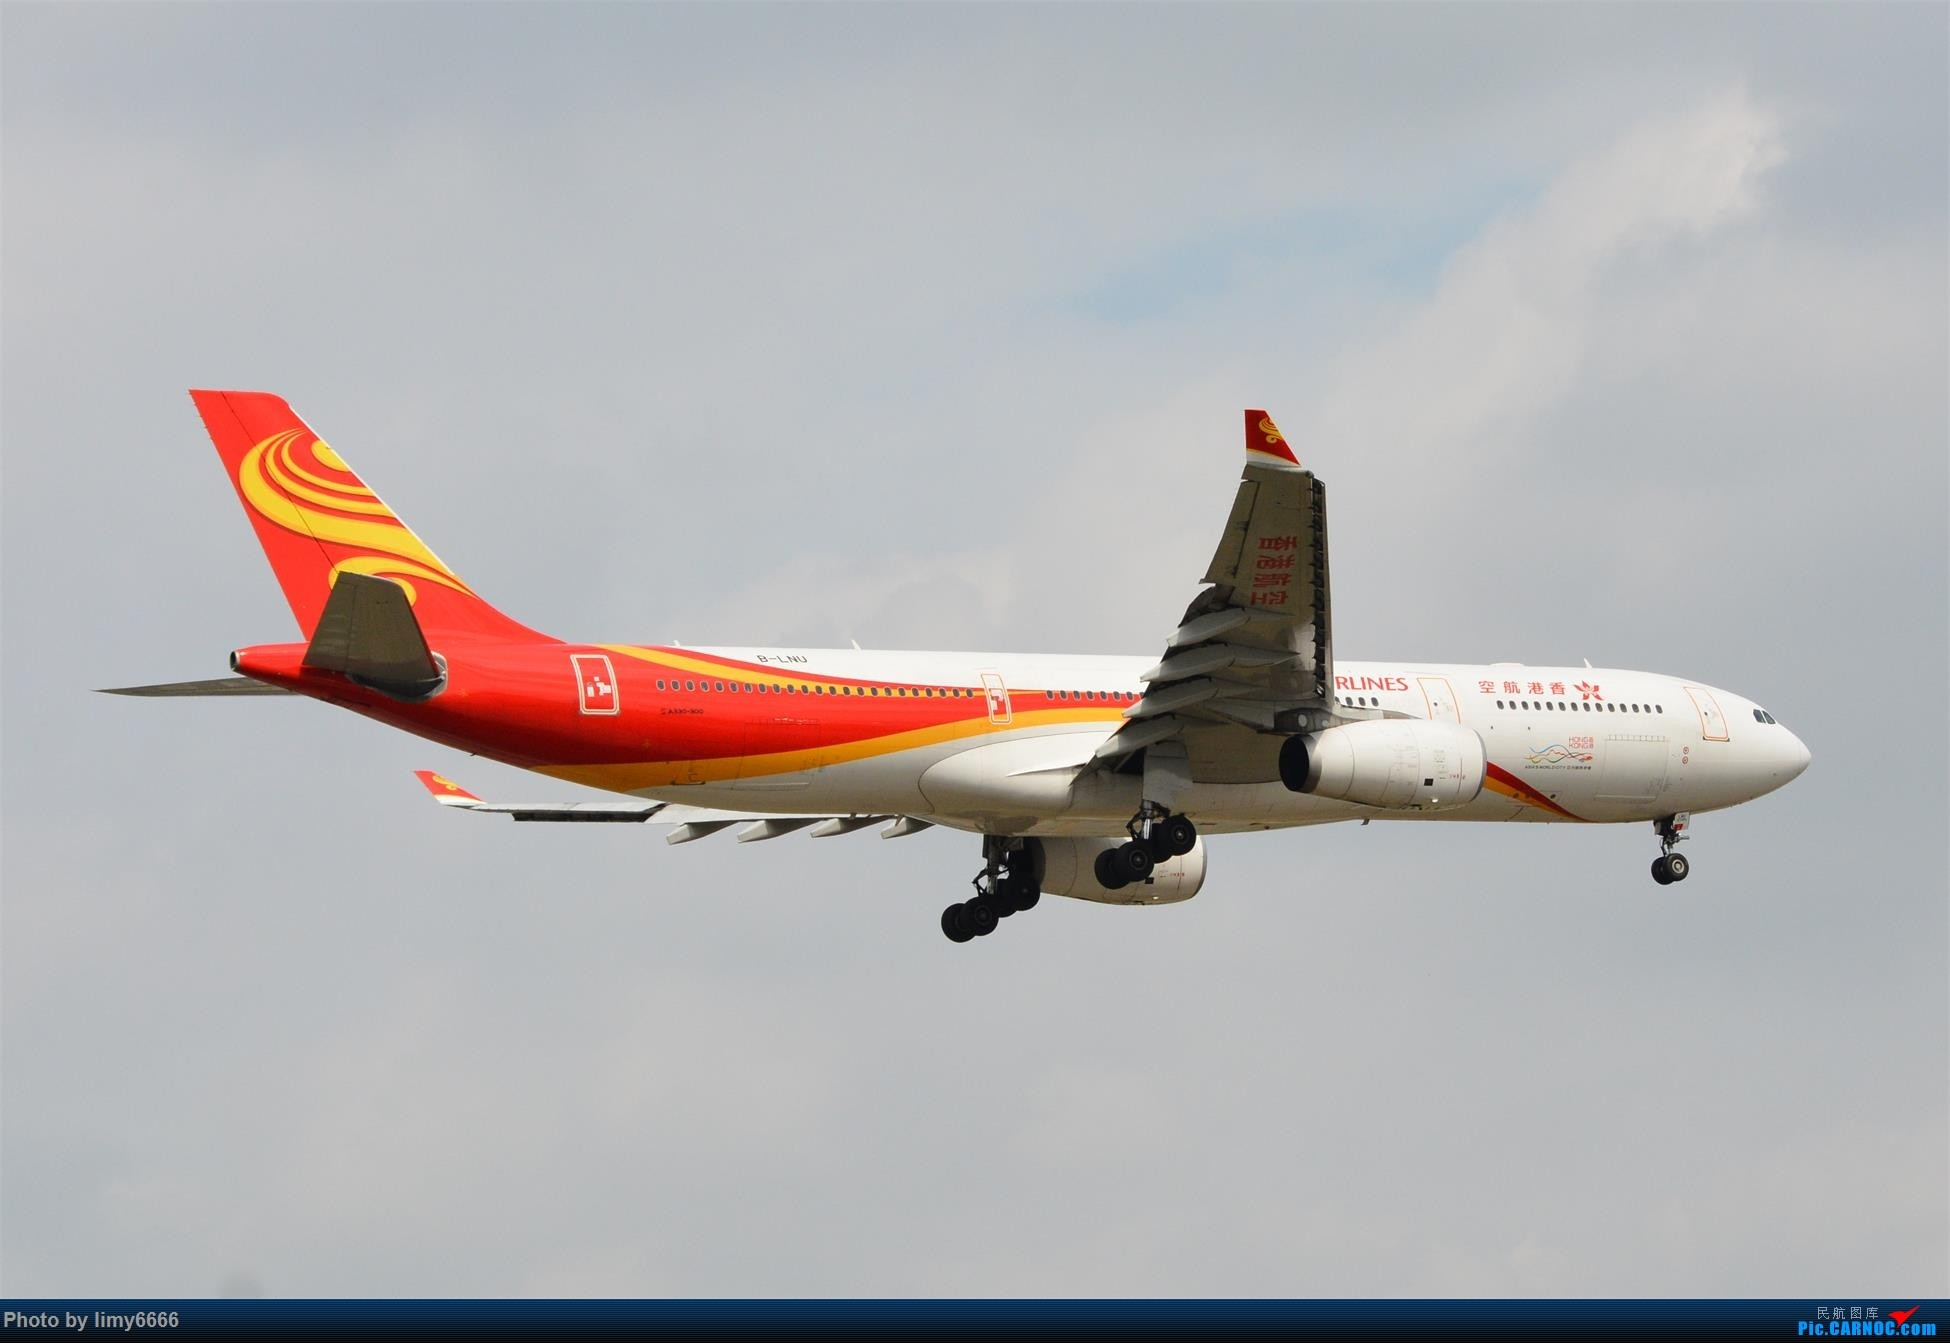 Re:[原创]上海虹桥机场拍机(在贵阳很少见或看不见的) AIRBUS A330-300 B-LNU 中国上海虹桥国际机场